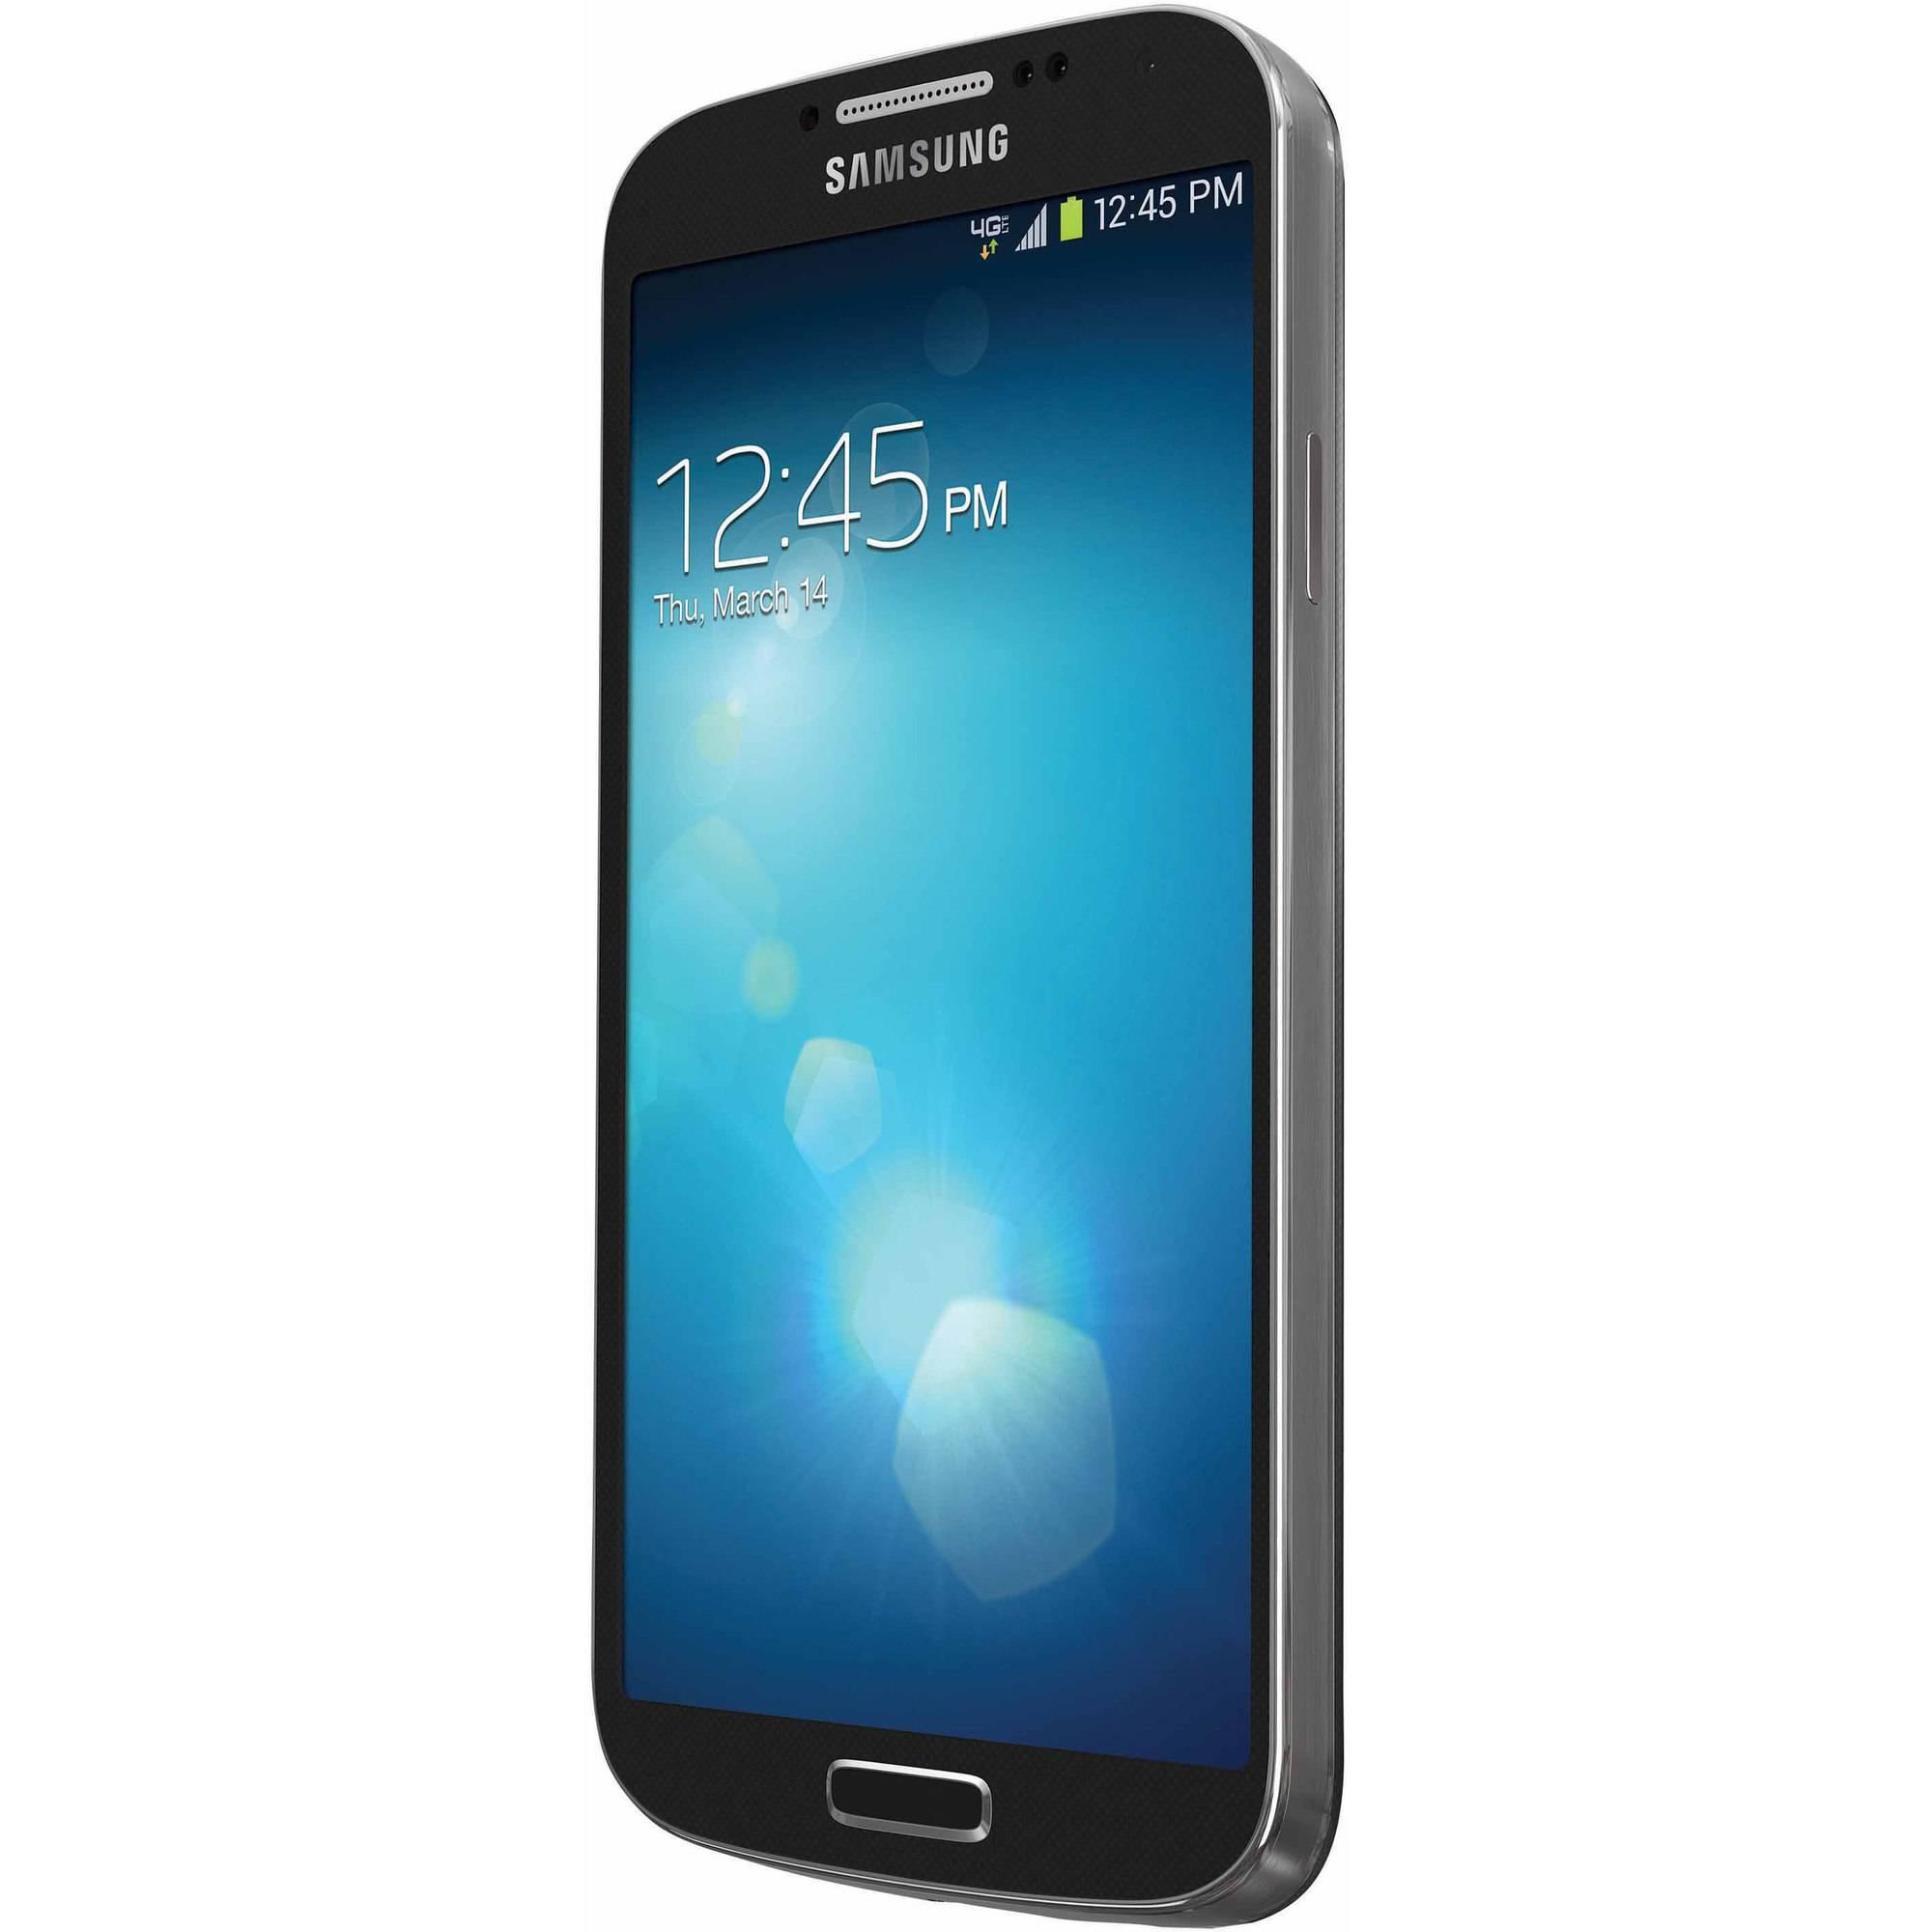 Verizon Samsung Galaxy S4 Prepaid Smartphone.